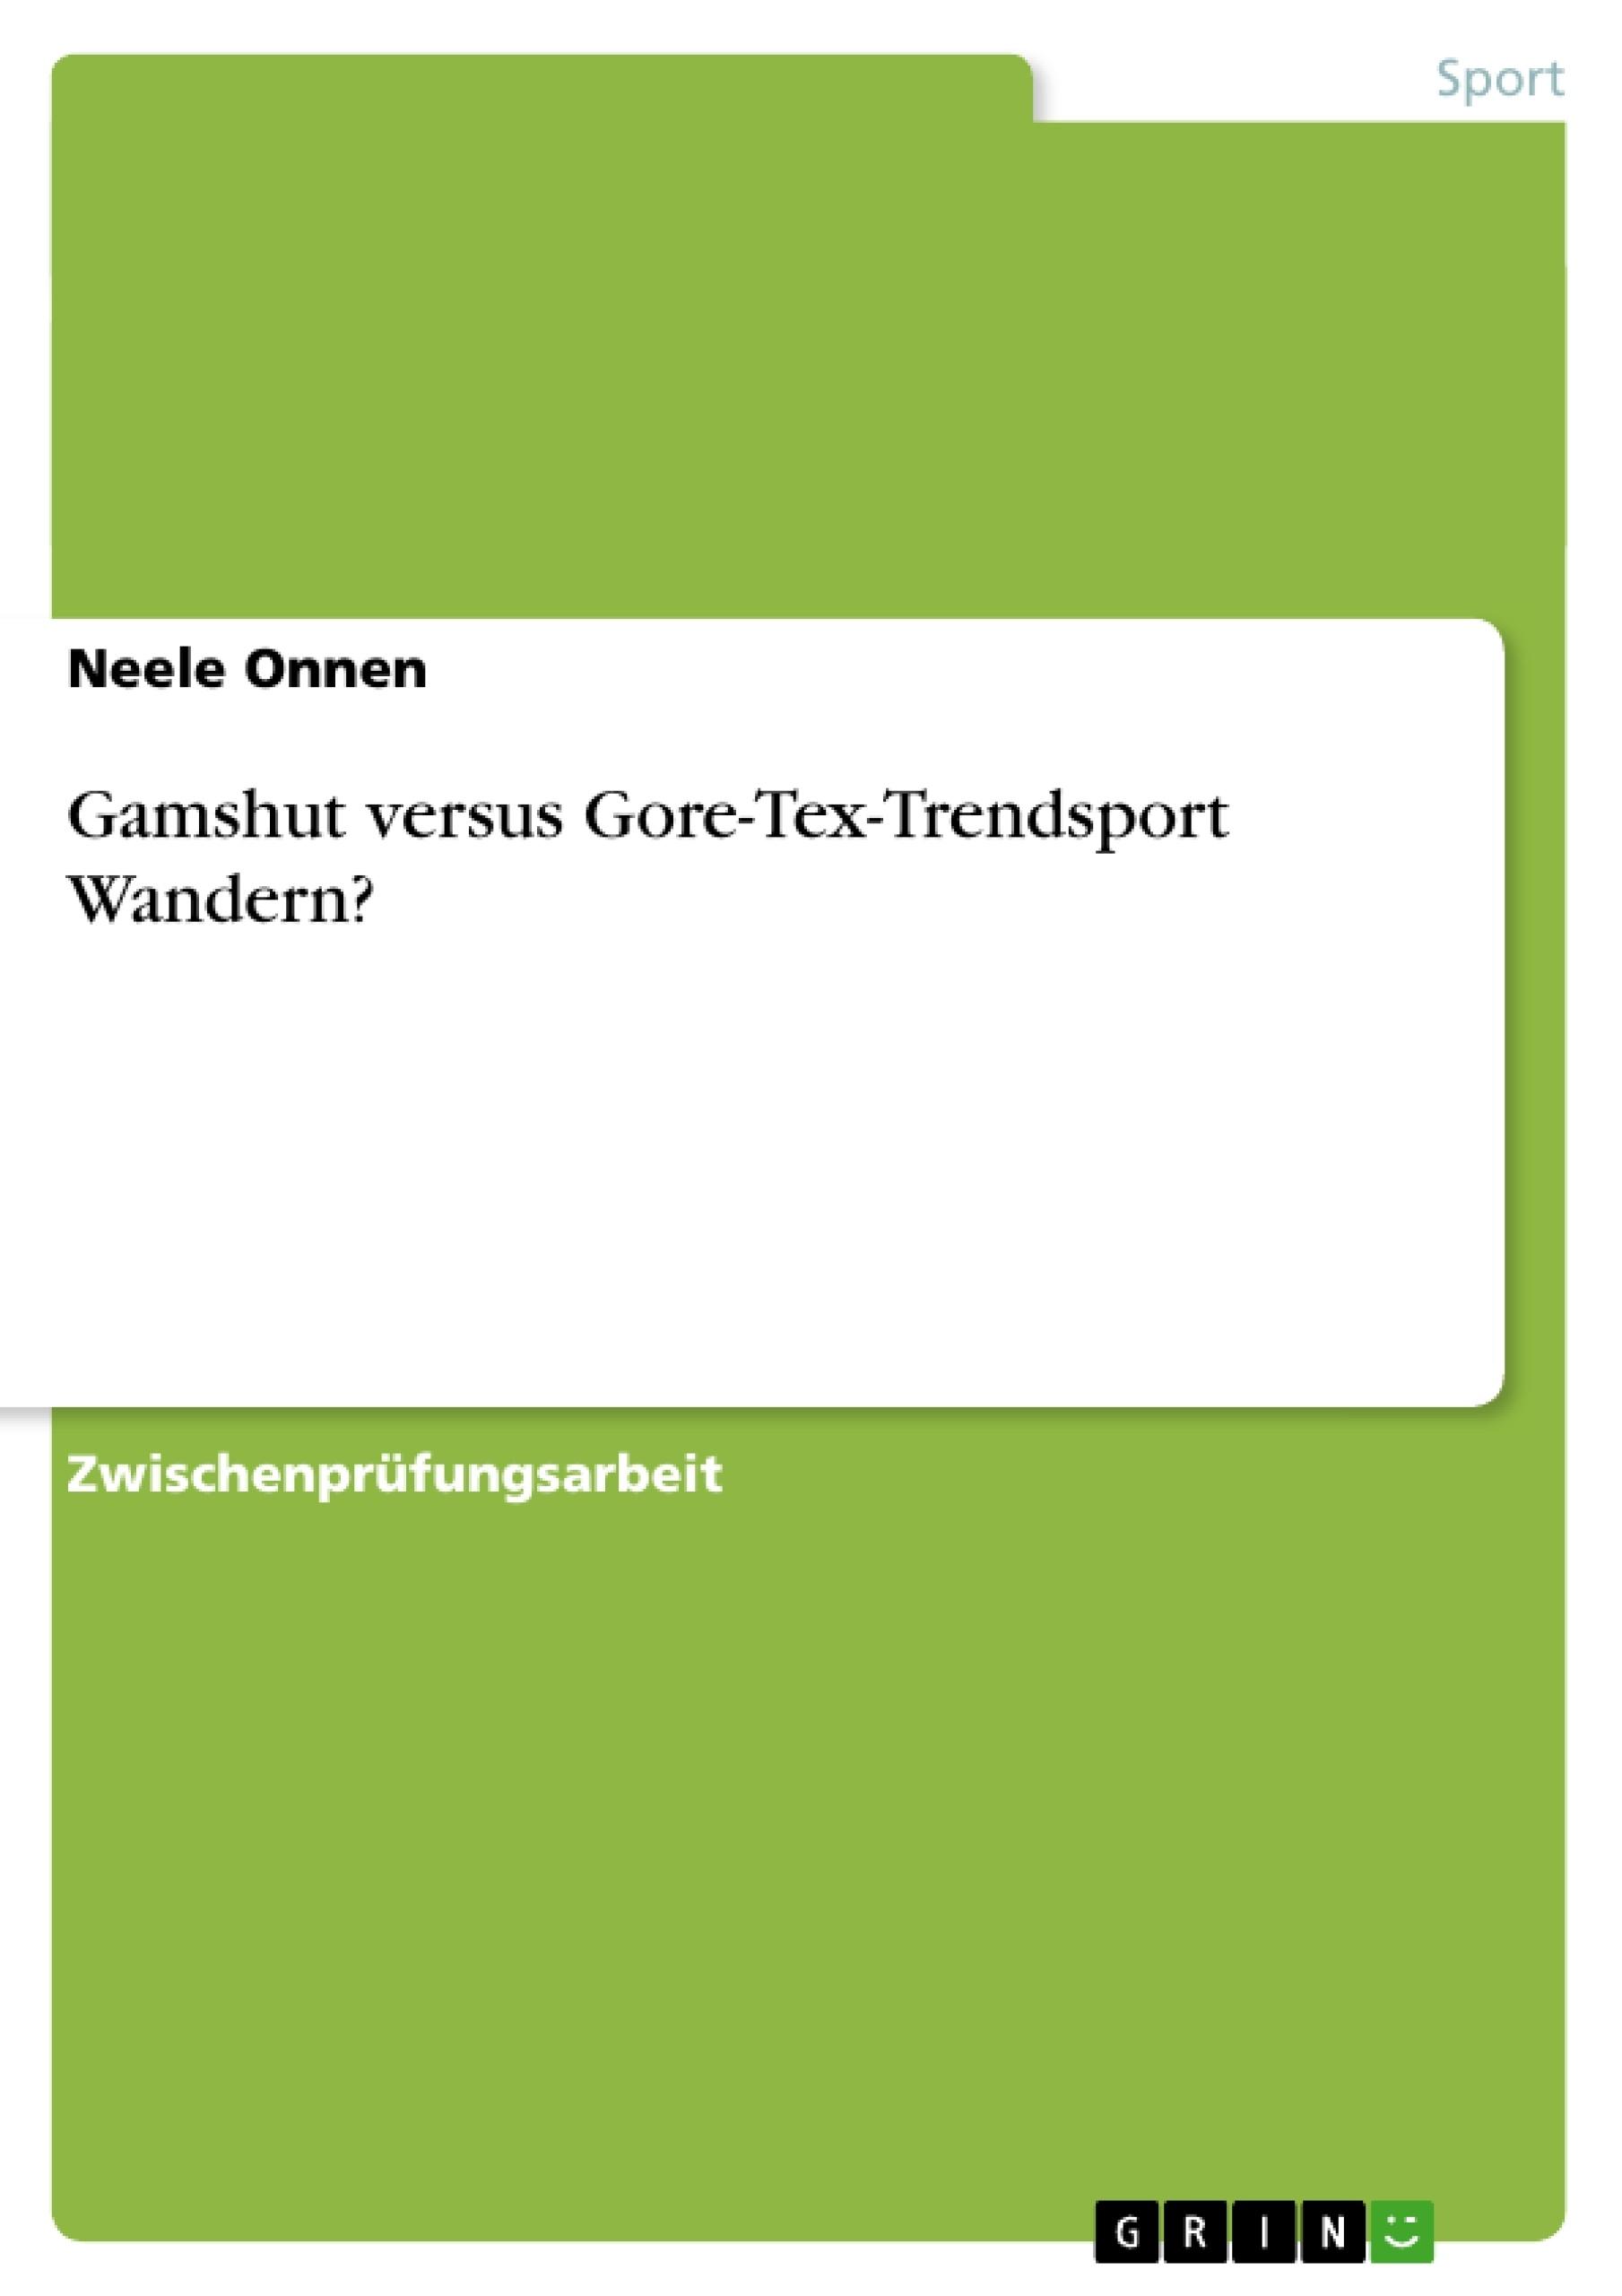 Titel: Gamshut versus Gore-Tex-Trendsport Wandern?